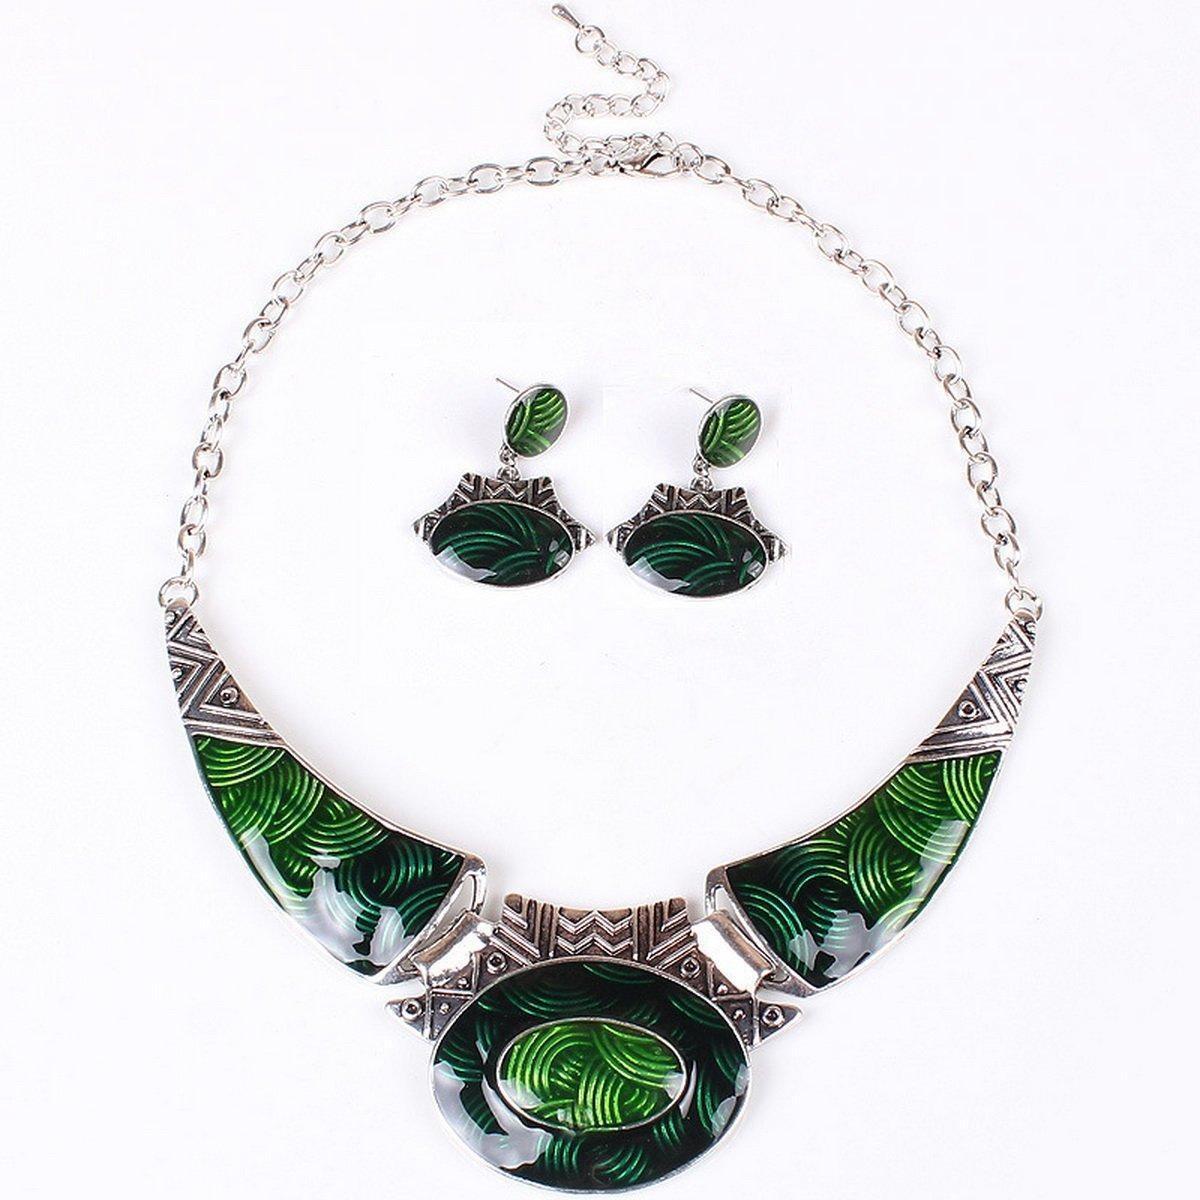 ARICO Enamel Jewelry Moon Jewelry Set Vintage Jewelry Sets Statement Necklace Set Earrings NB307